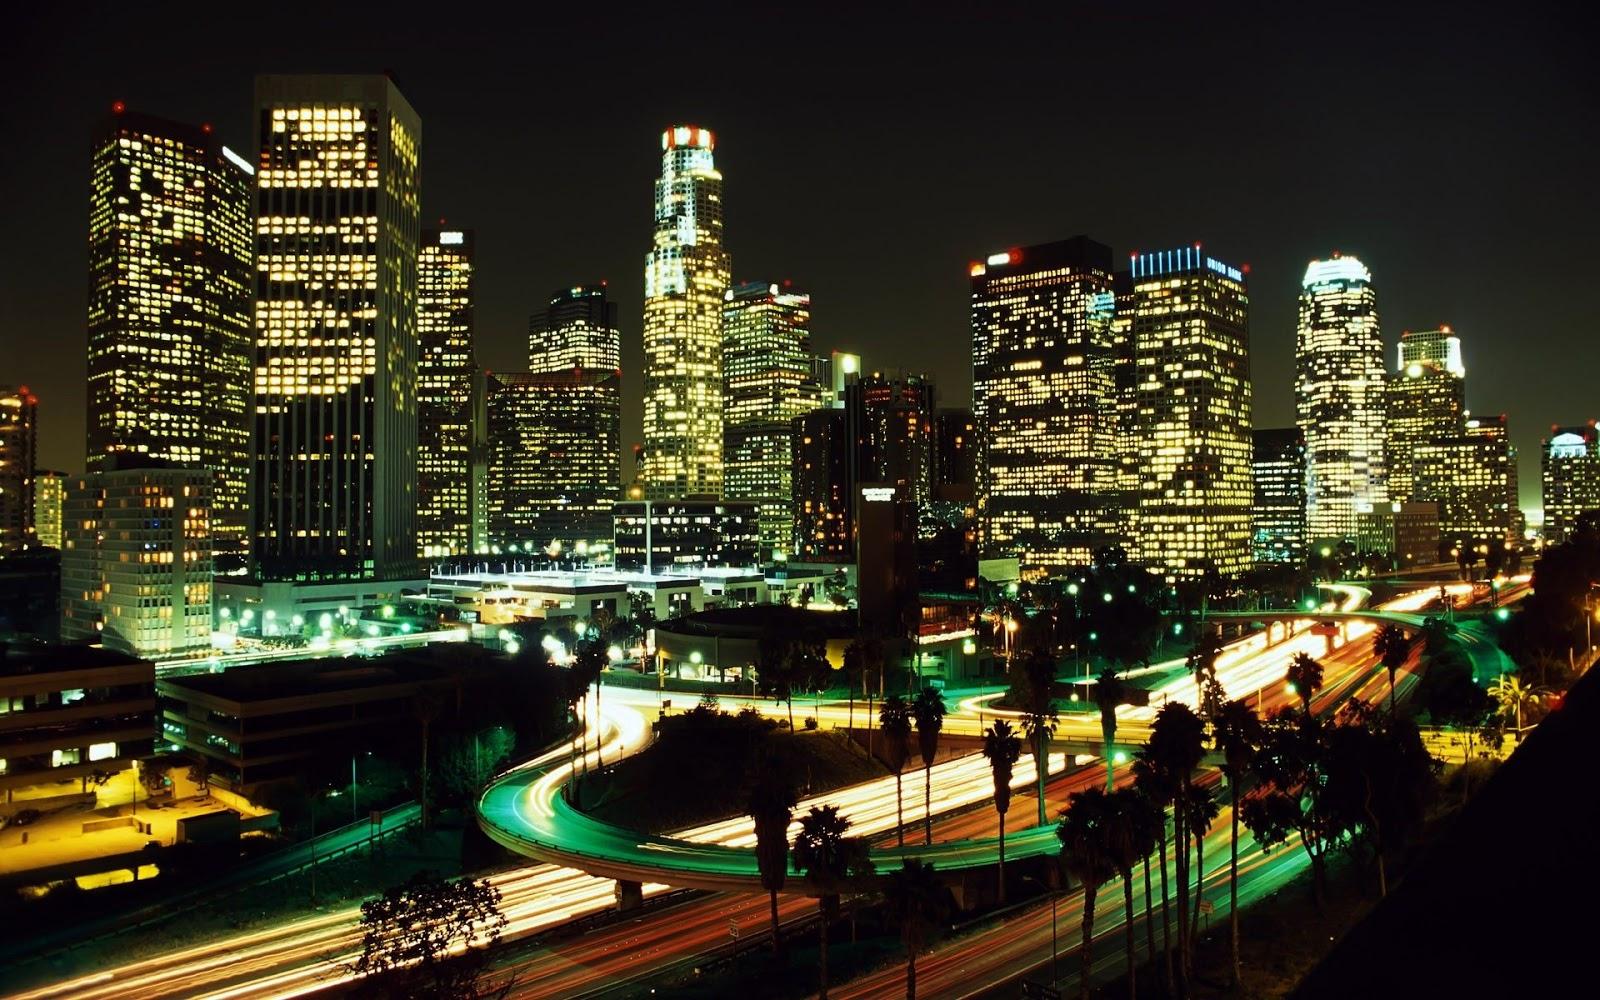 la city cool 250w - photo #29